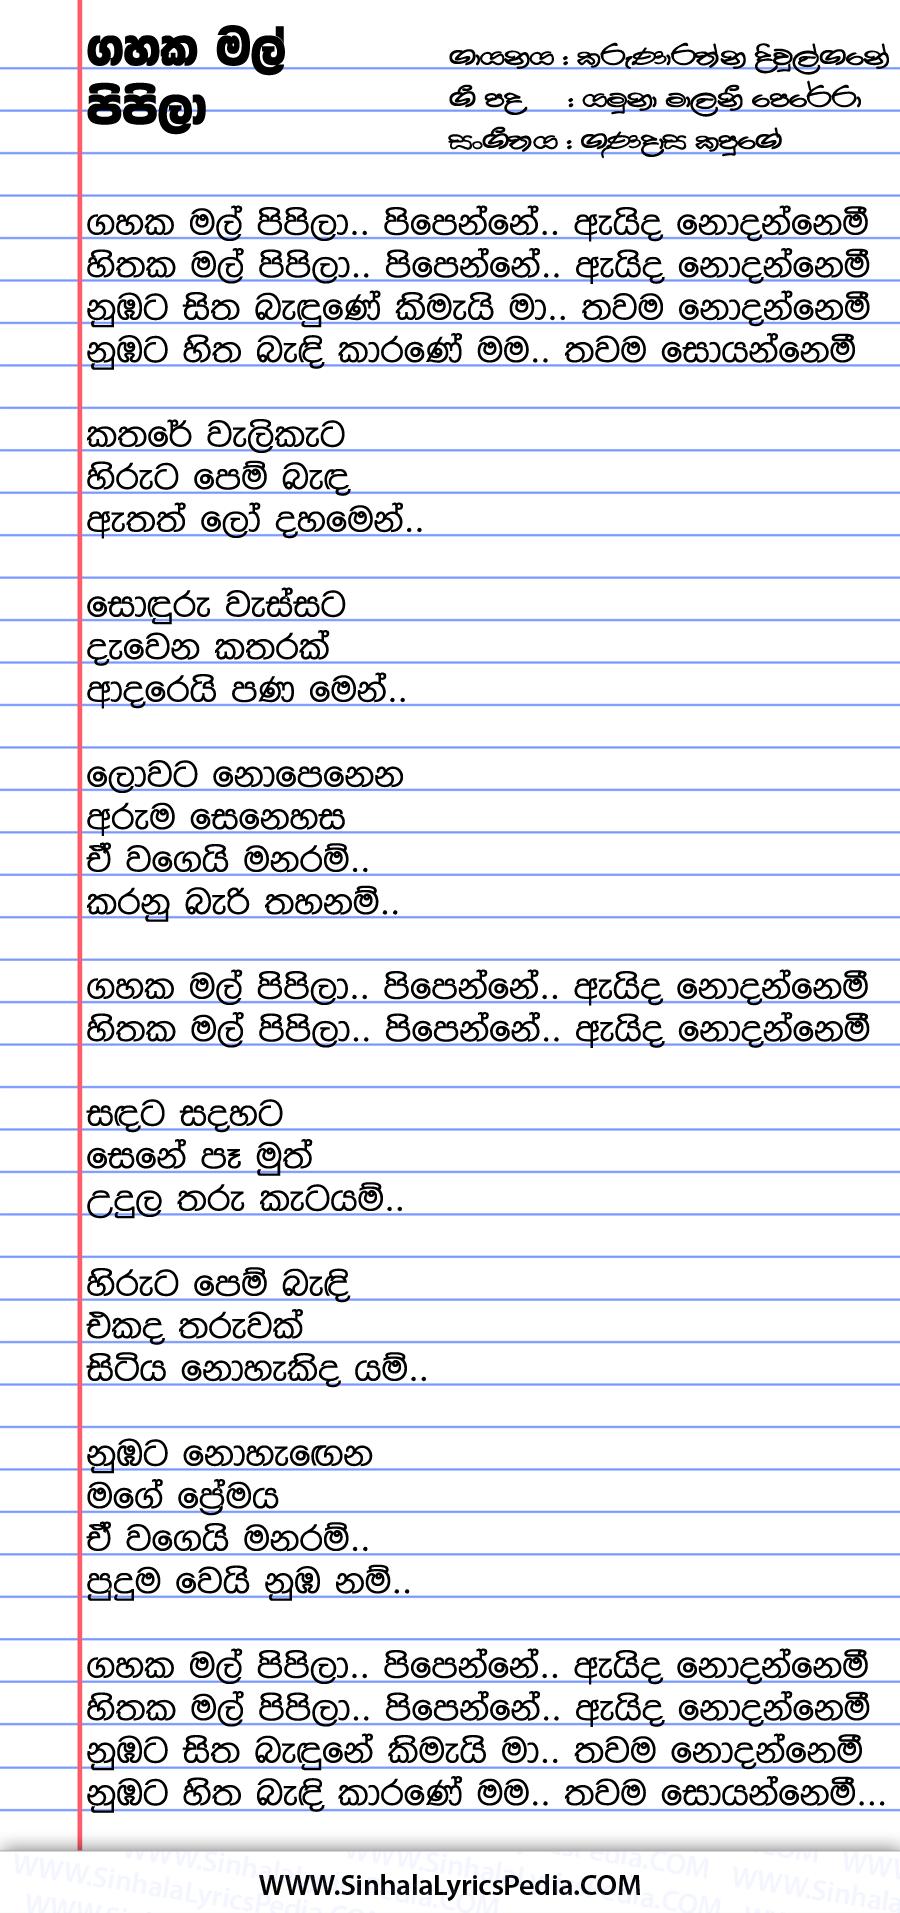 Gahaka Mal Pipila Pipenne Aida Nodannemi Song Lyrics